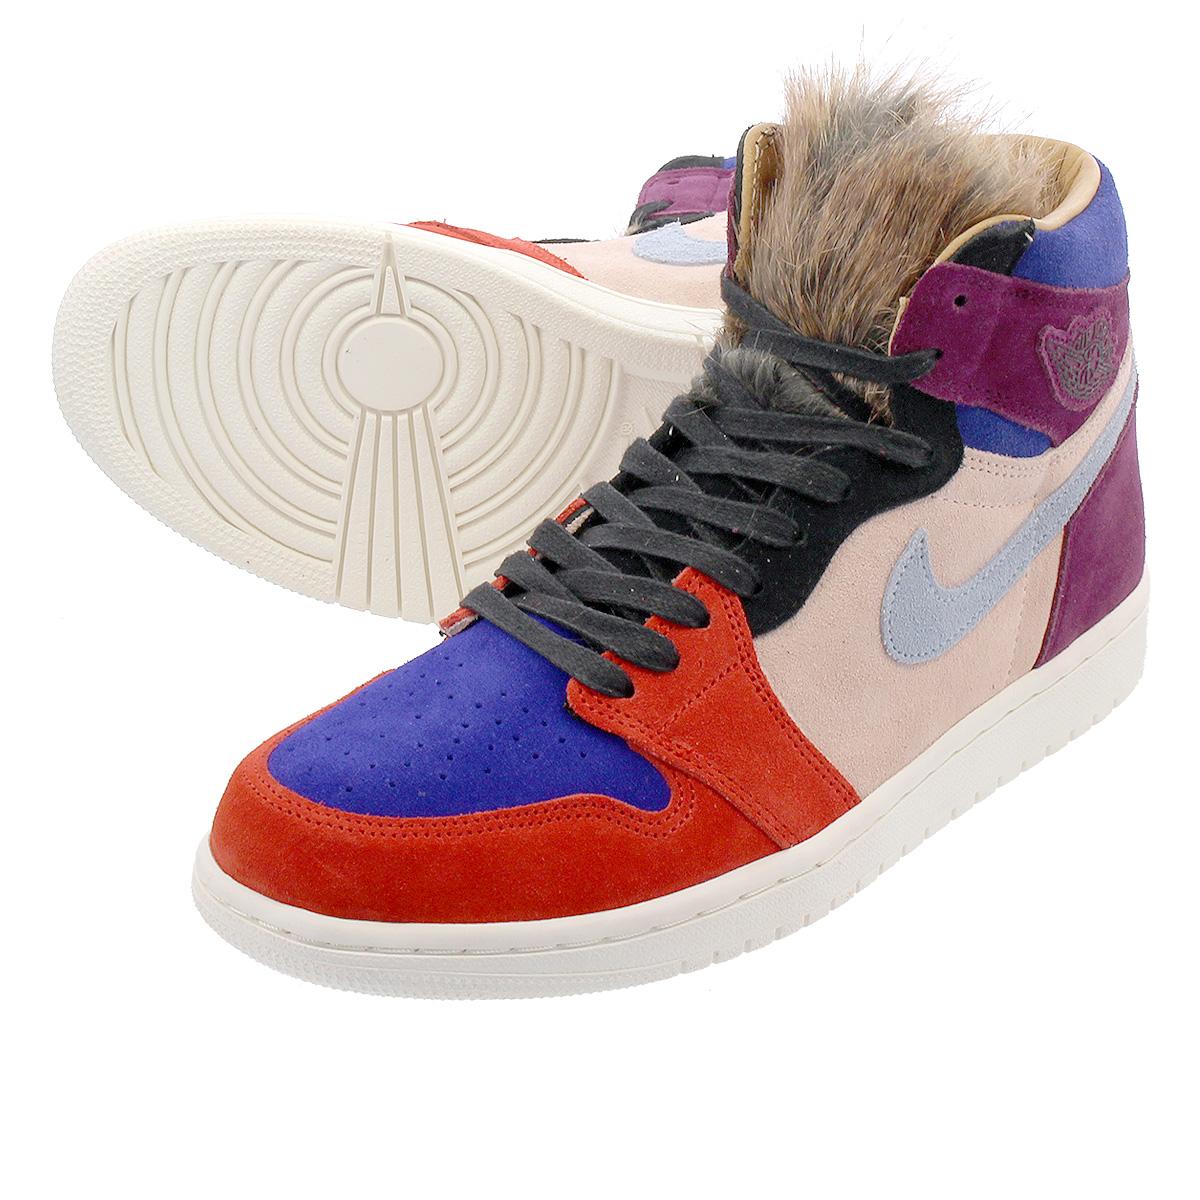 7b63e85247aabf NIKE WMNS AIR JORDAN 1 RETRO HIGH OG NRG Nike women Air Jordan 1 nostalgic high  OG NRG CORE BORDEAUX SUNSET TINT RUSH RED LIGHT ARMORY BLUE bv2613-600